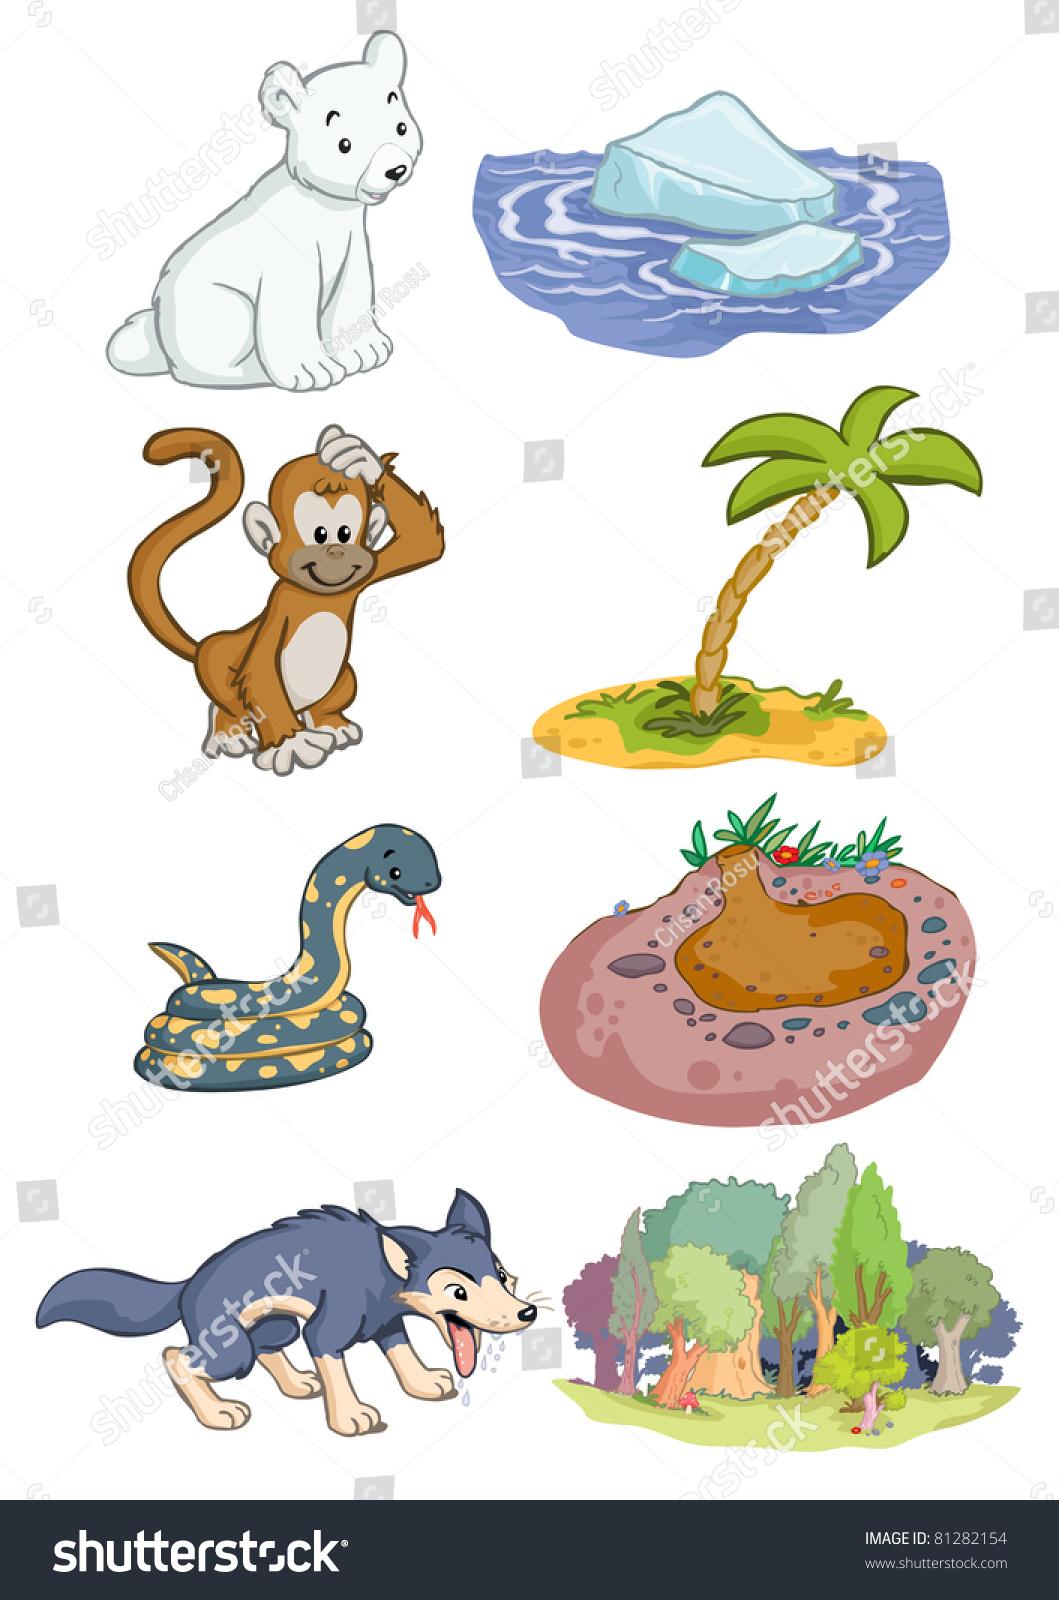 Vector Illustration Animals Habitat Cartoon Concept Stock